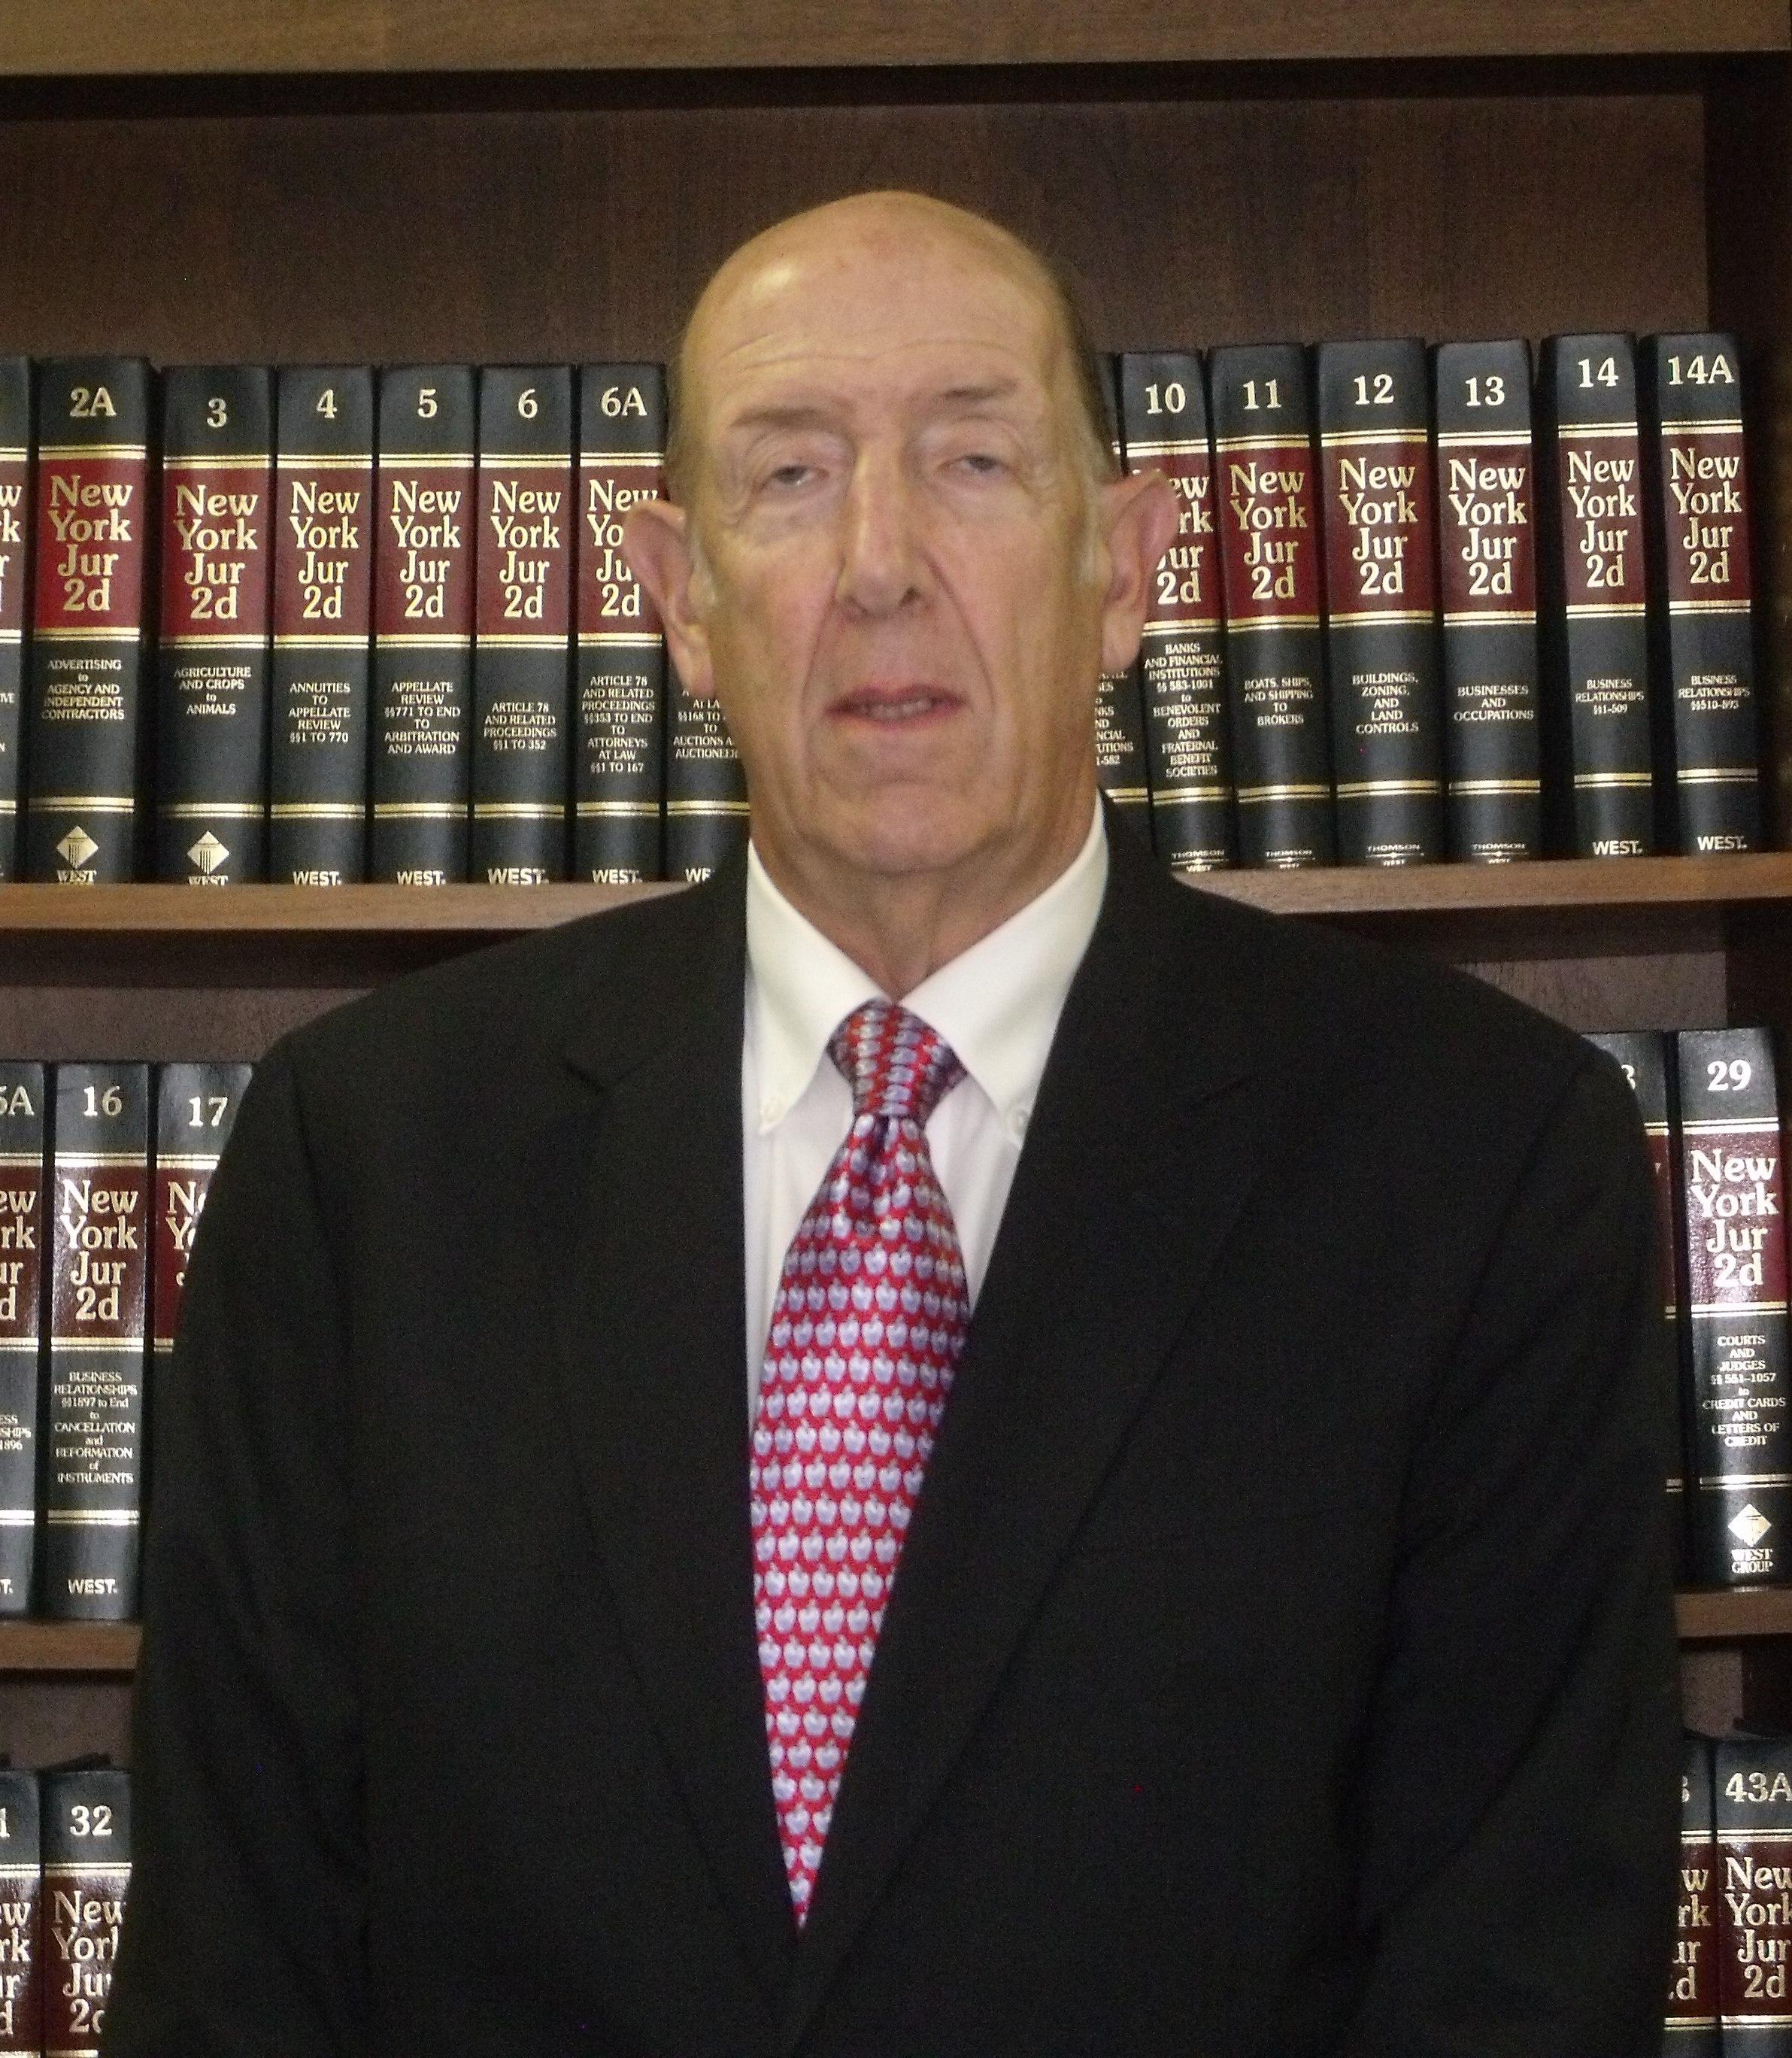 Barry L. Mendelson